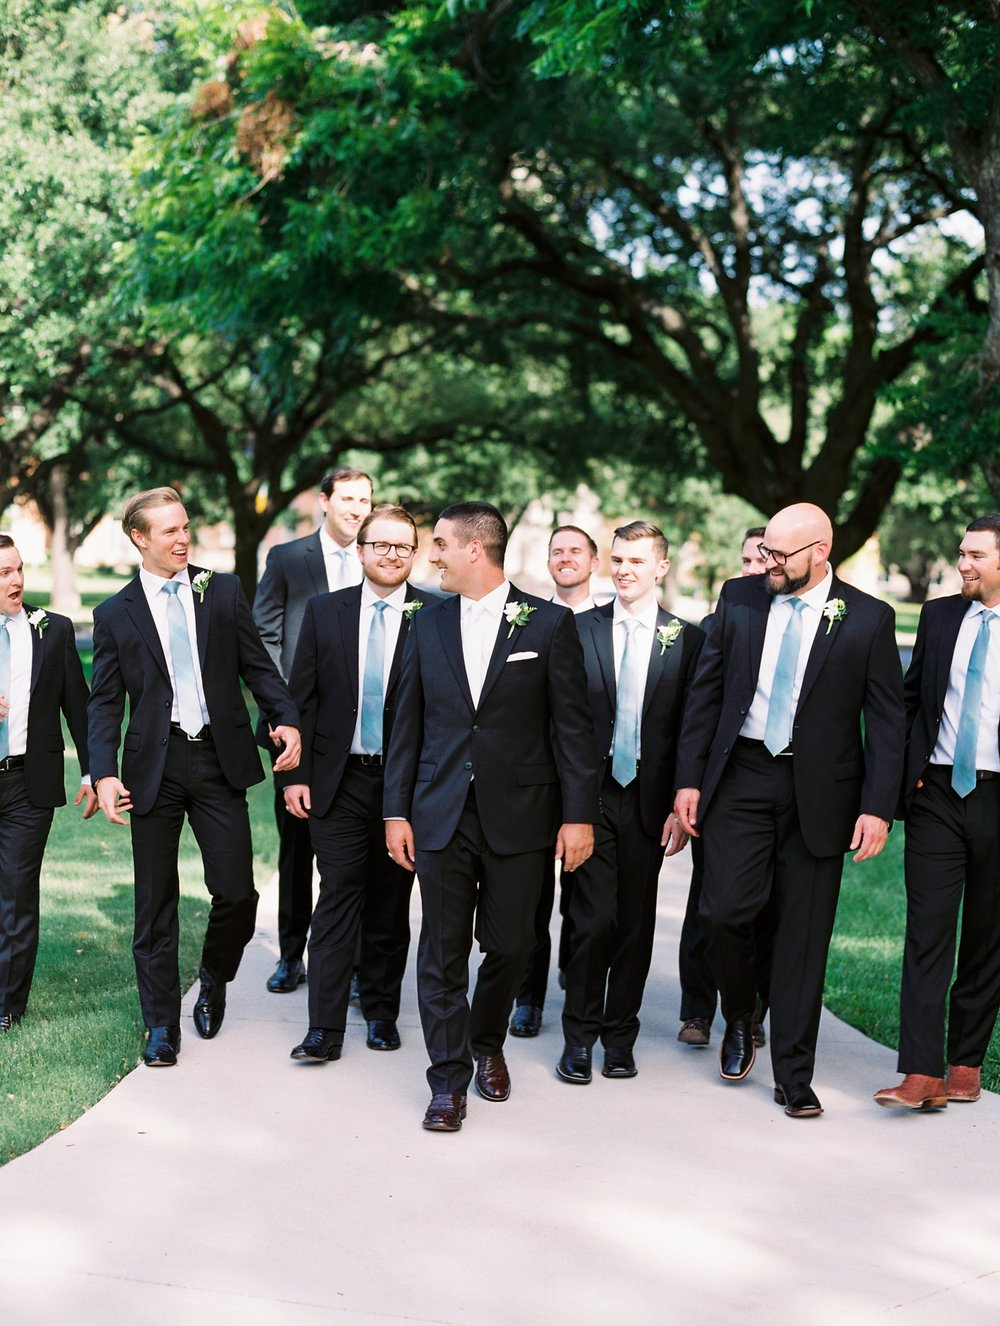 Hill Country Wedding Austin Texas Wedding Photographer_0088.jpg